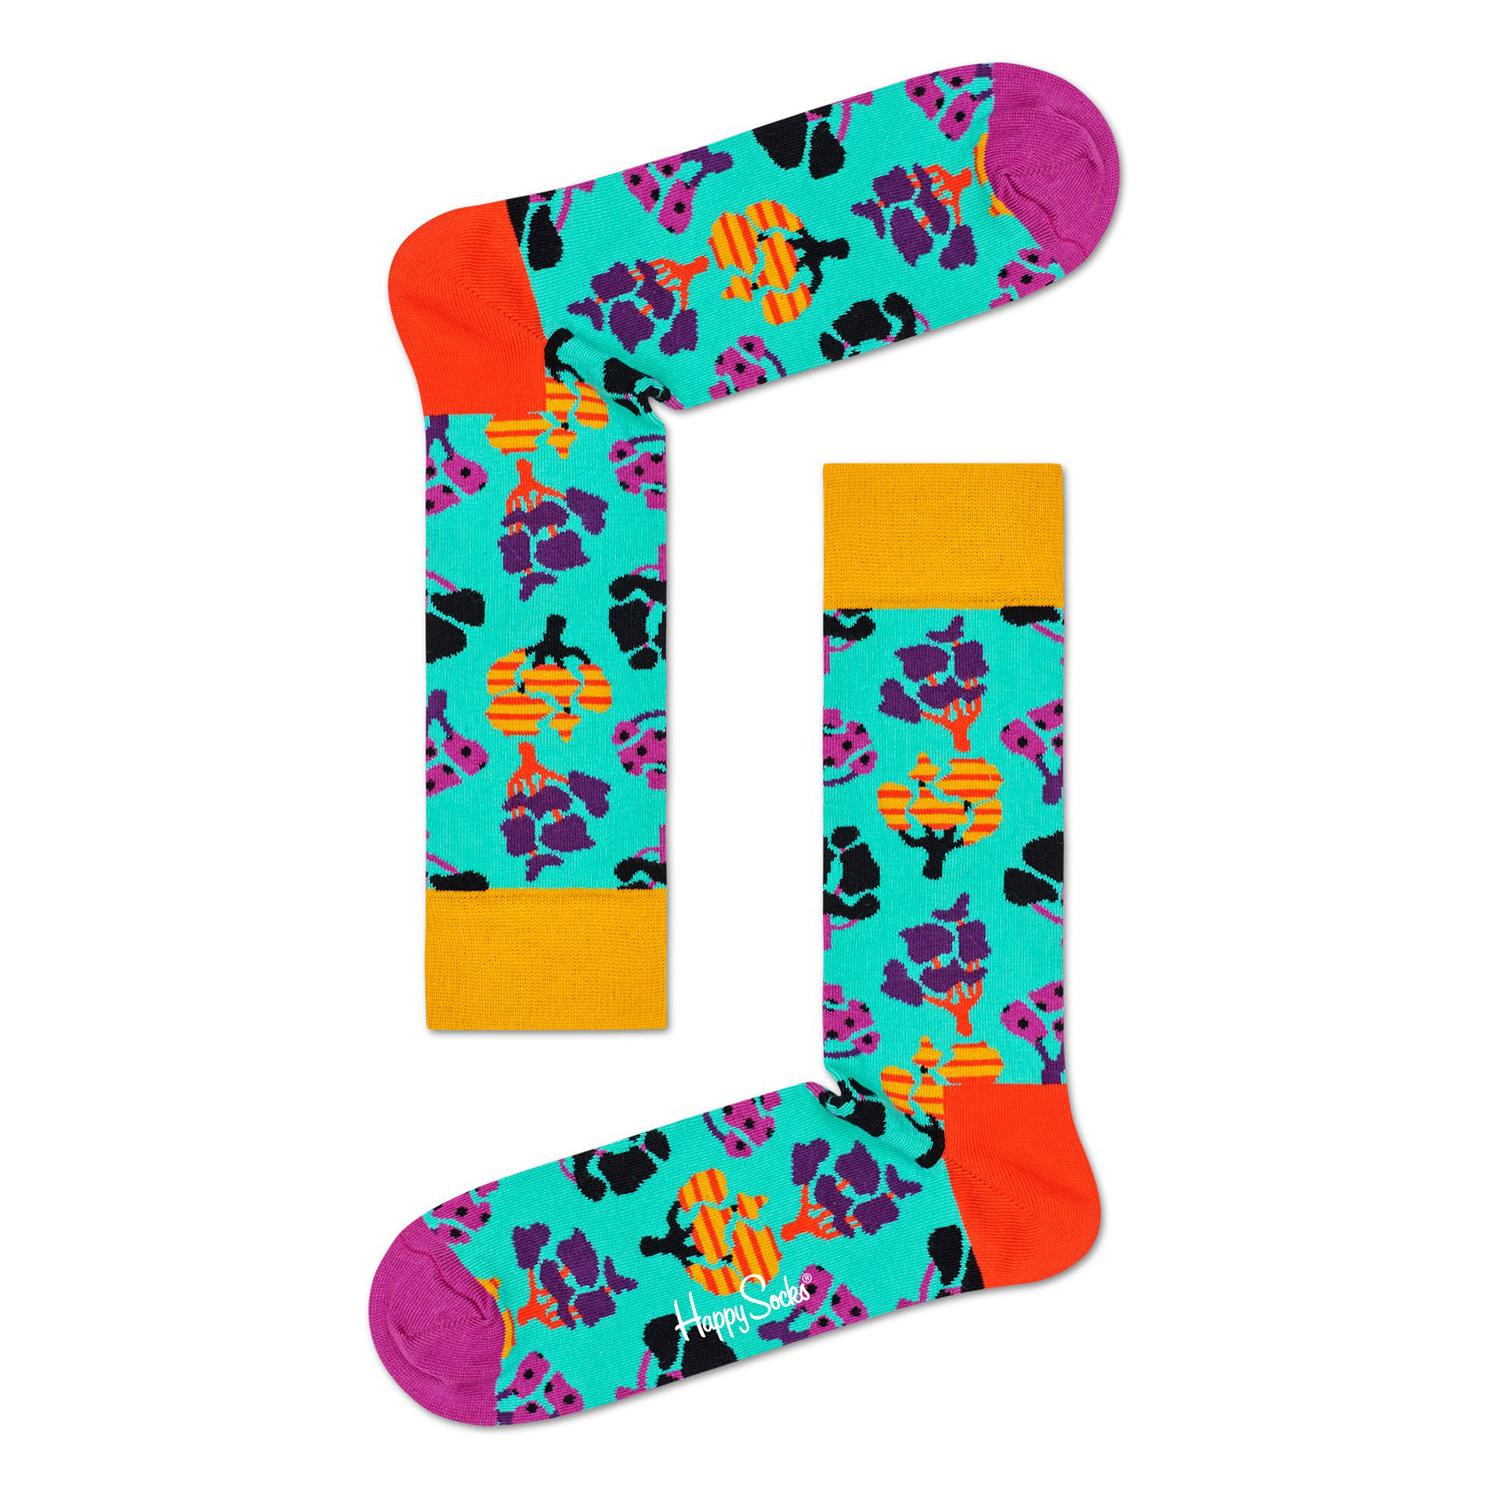 Happy Socks – Set of 4 Pairs of Day In The Park Socks in Presentation Gift Box